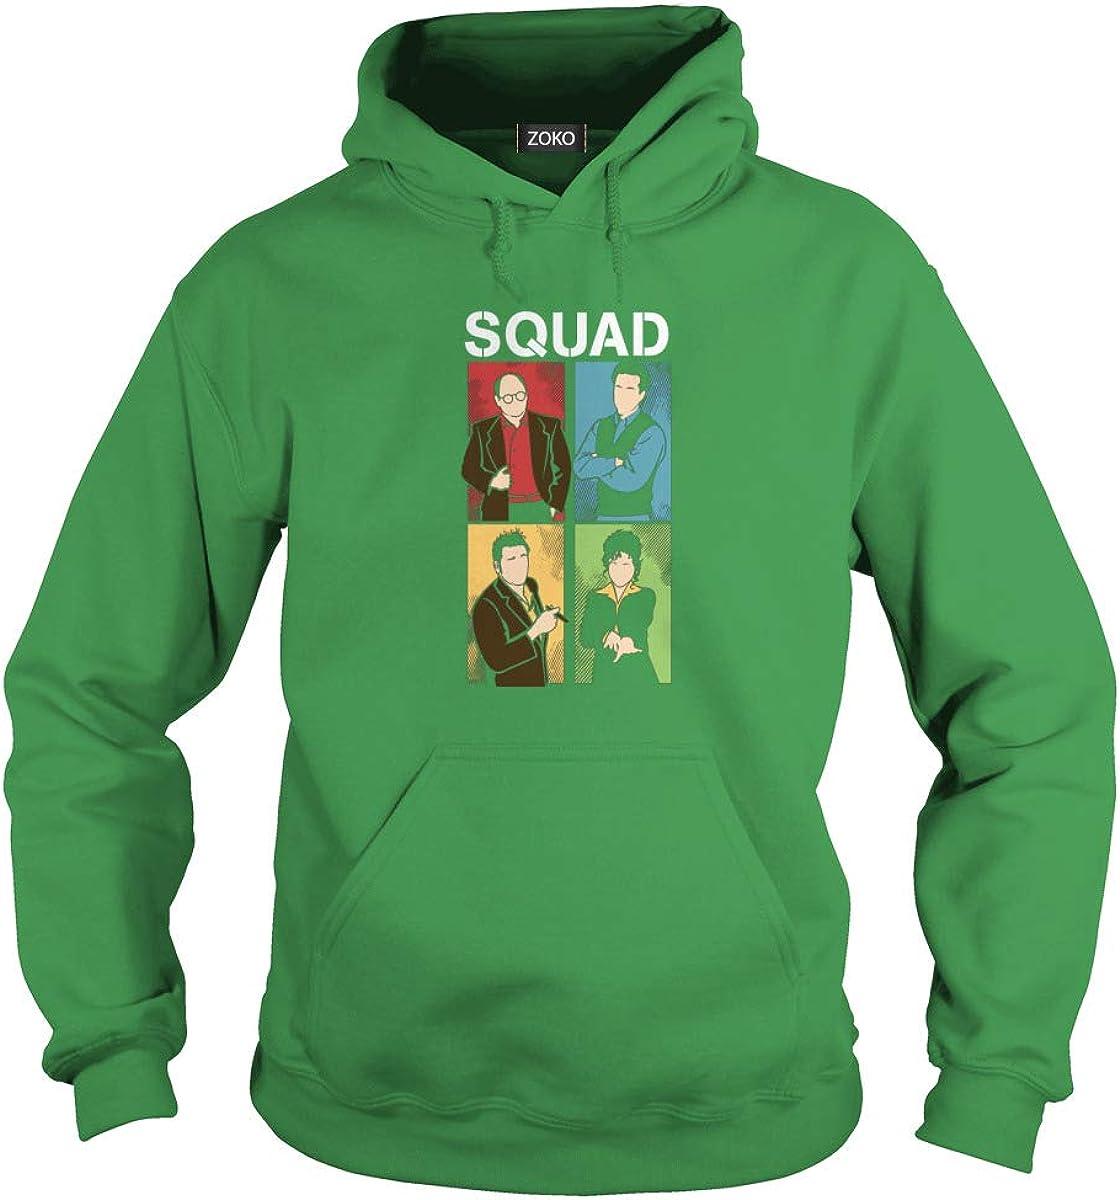 Zoko Apparel Squad Funny T-Shirt